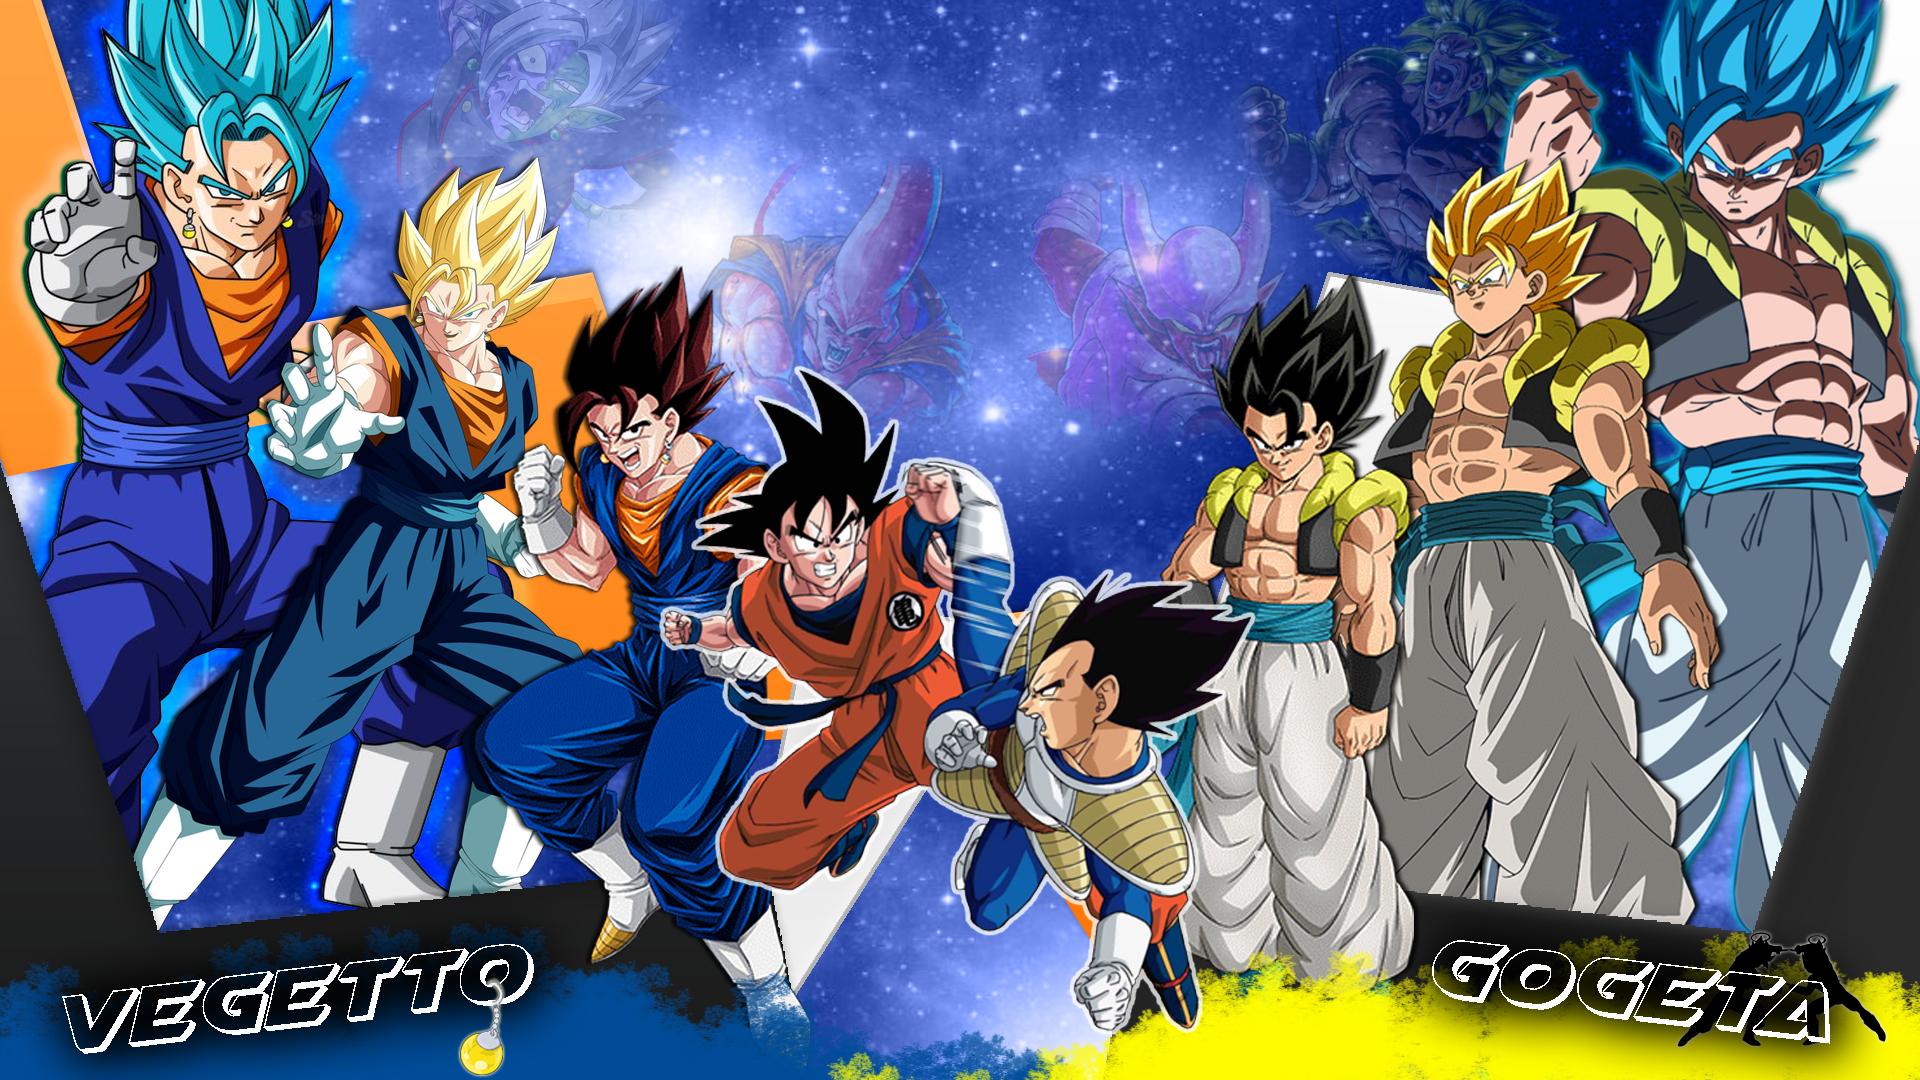 Son Goku, Vegeta, Gogeta, Vegetto